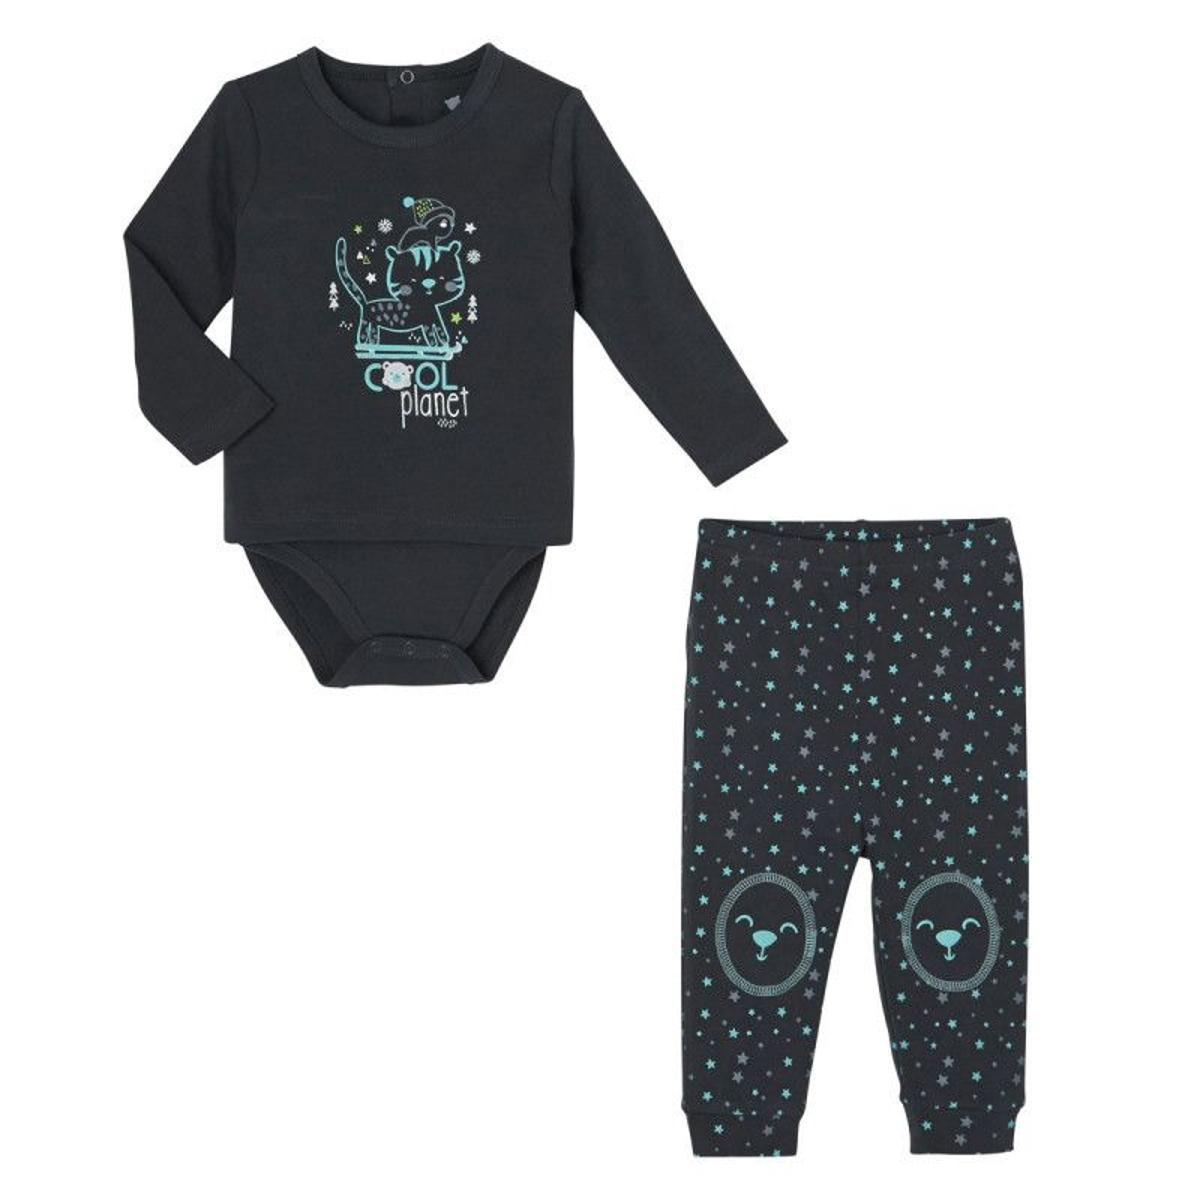 Ensemble bébé garçon body T-shirt + pantalon Cool Planet